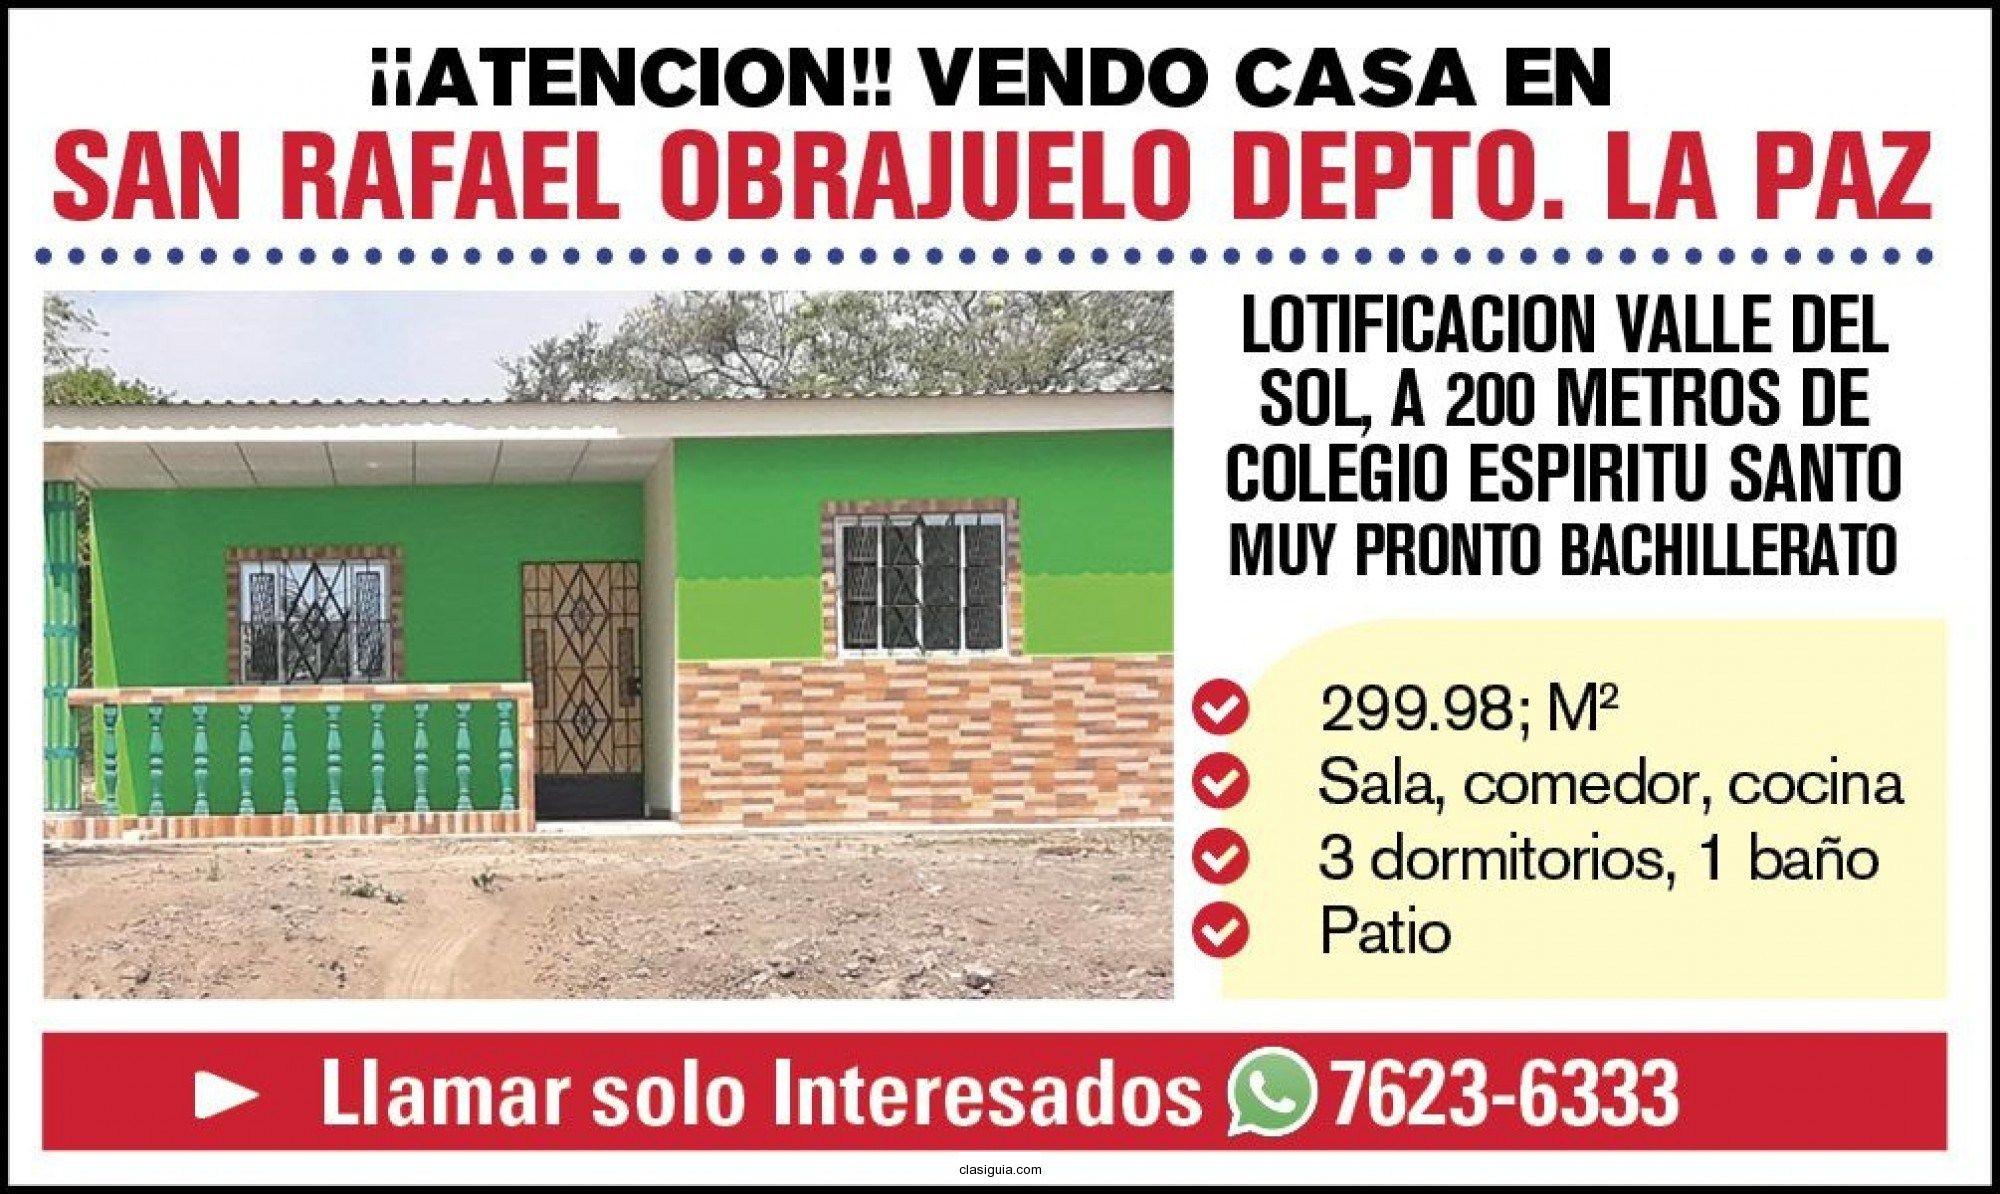 ATENCION CASA EN SAN RAFAEL OBRAJUELO LA PAZ